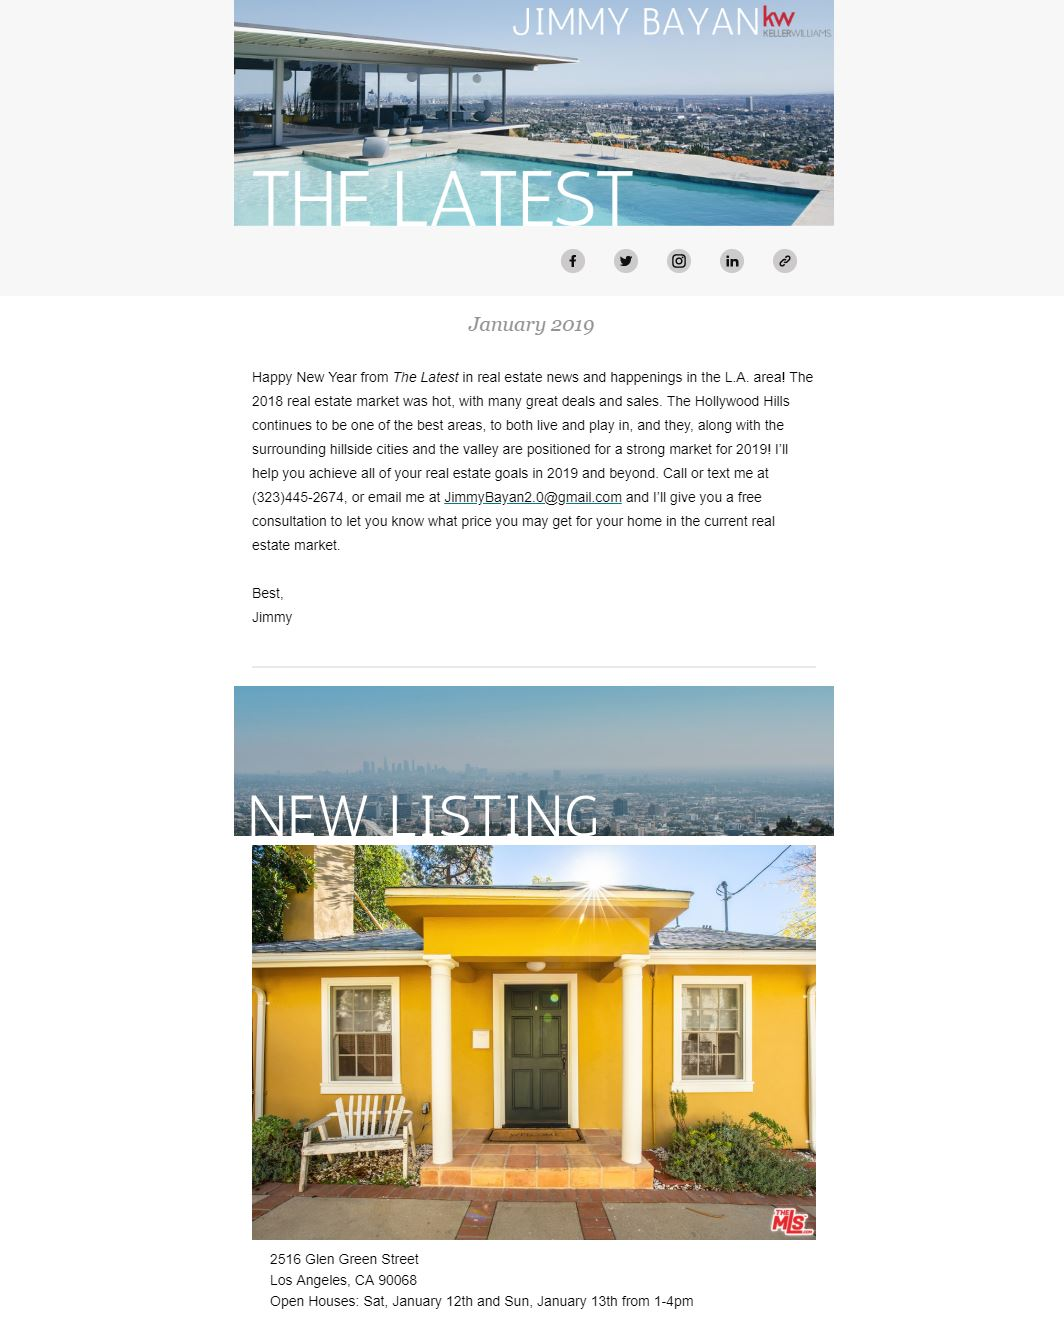 MailChimp newsletter for Los Angeles real estate agent